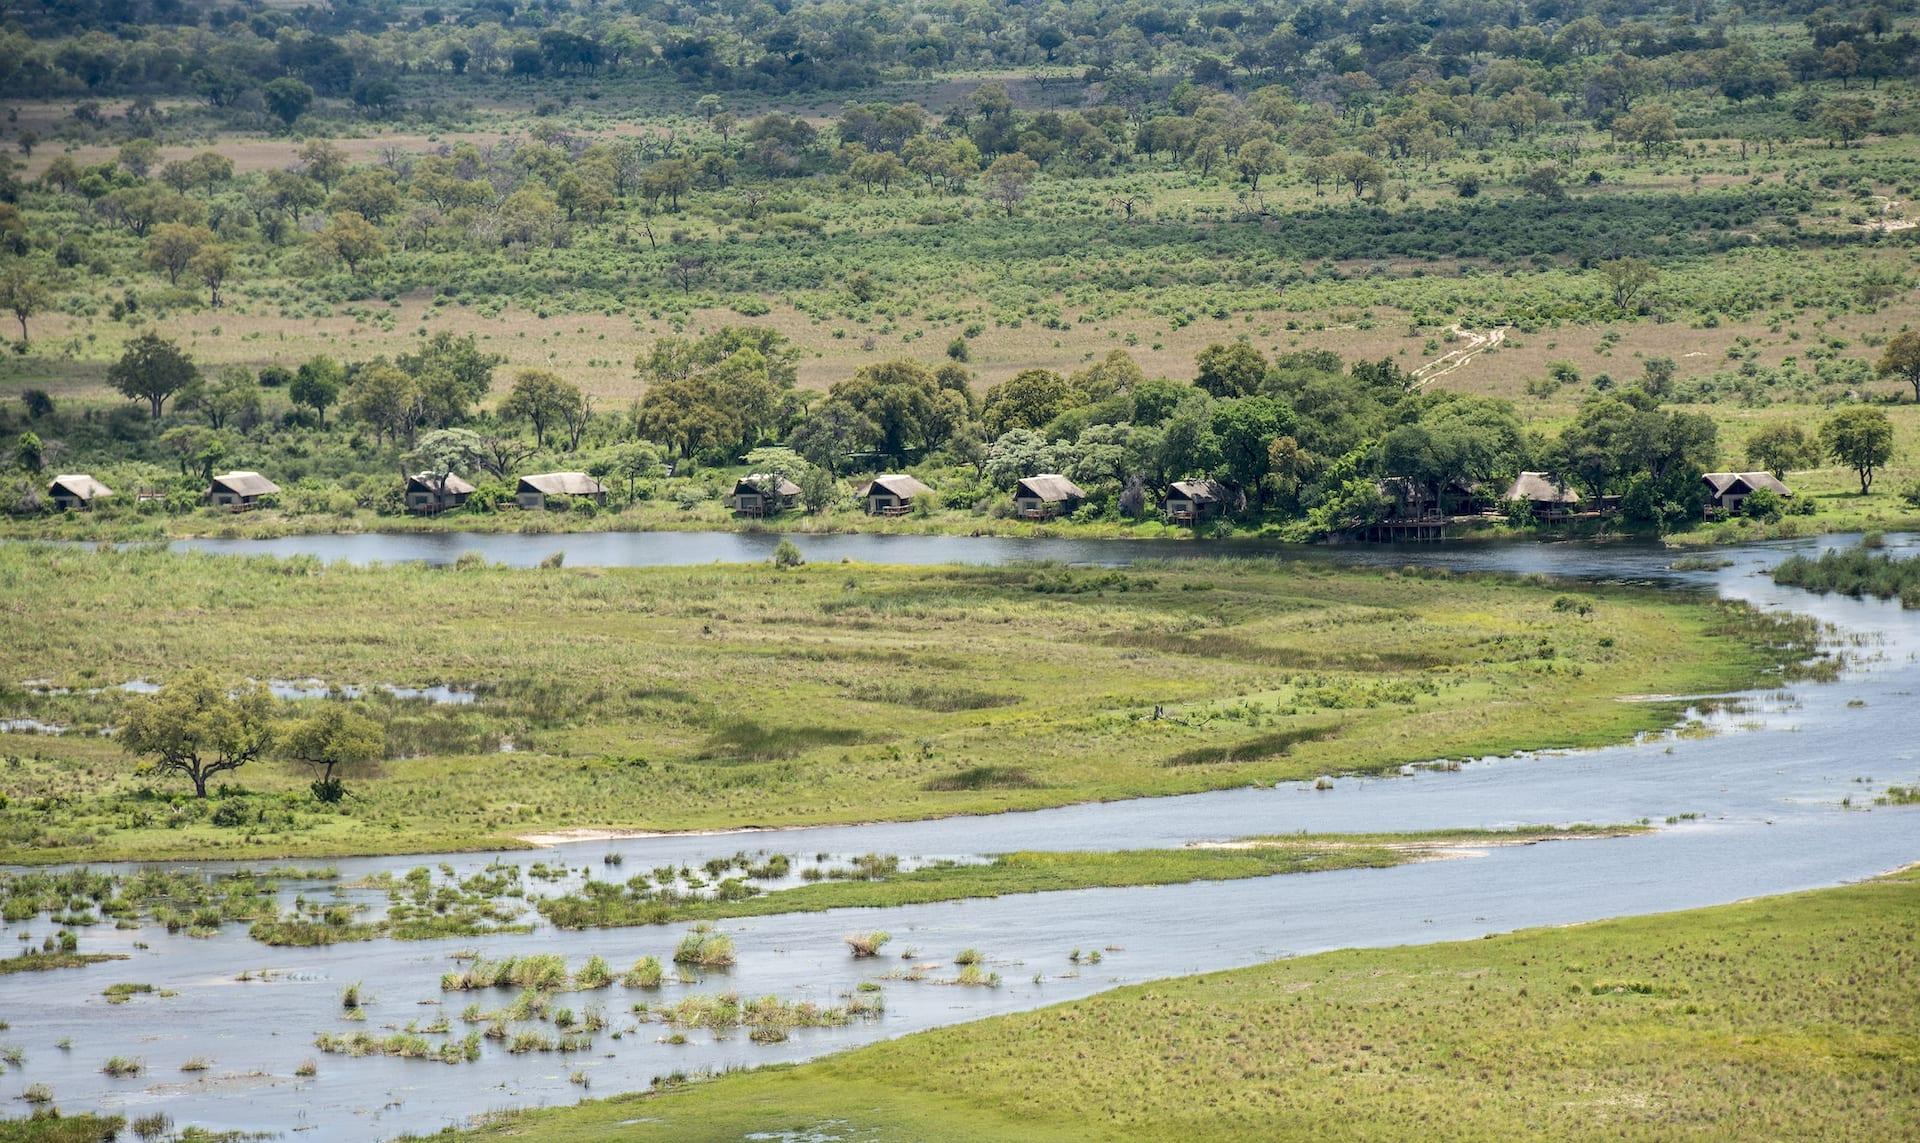 ALGEMEEN 6 - BW - Kwando Safaris - Lagoon aerial 2 - BW 2